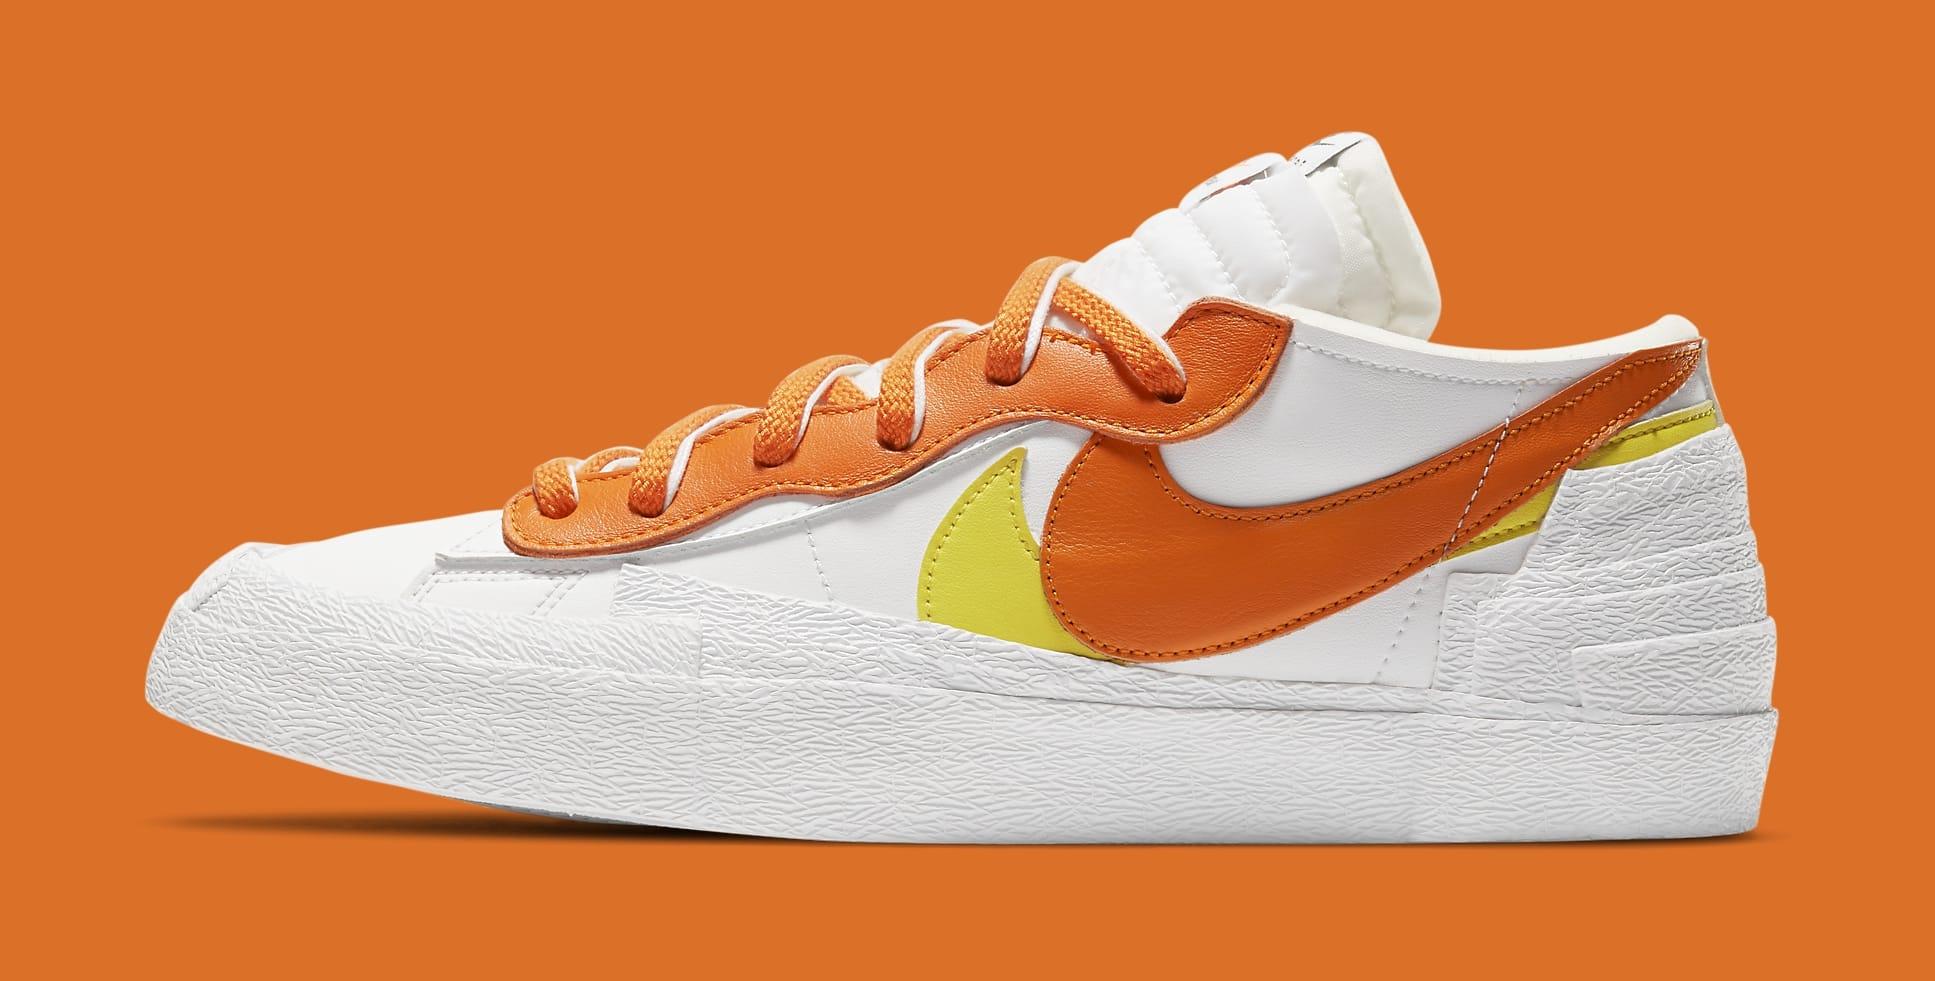 Sacai x Nike Blazer Low 'Magma Orange' DD1877-100 Lateral